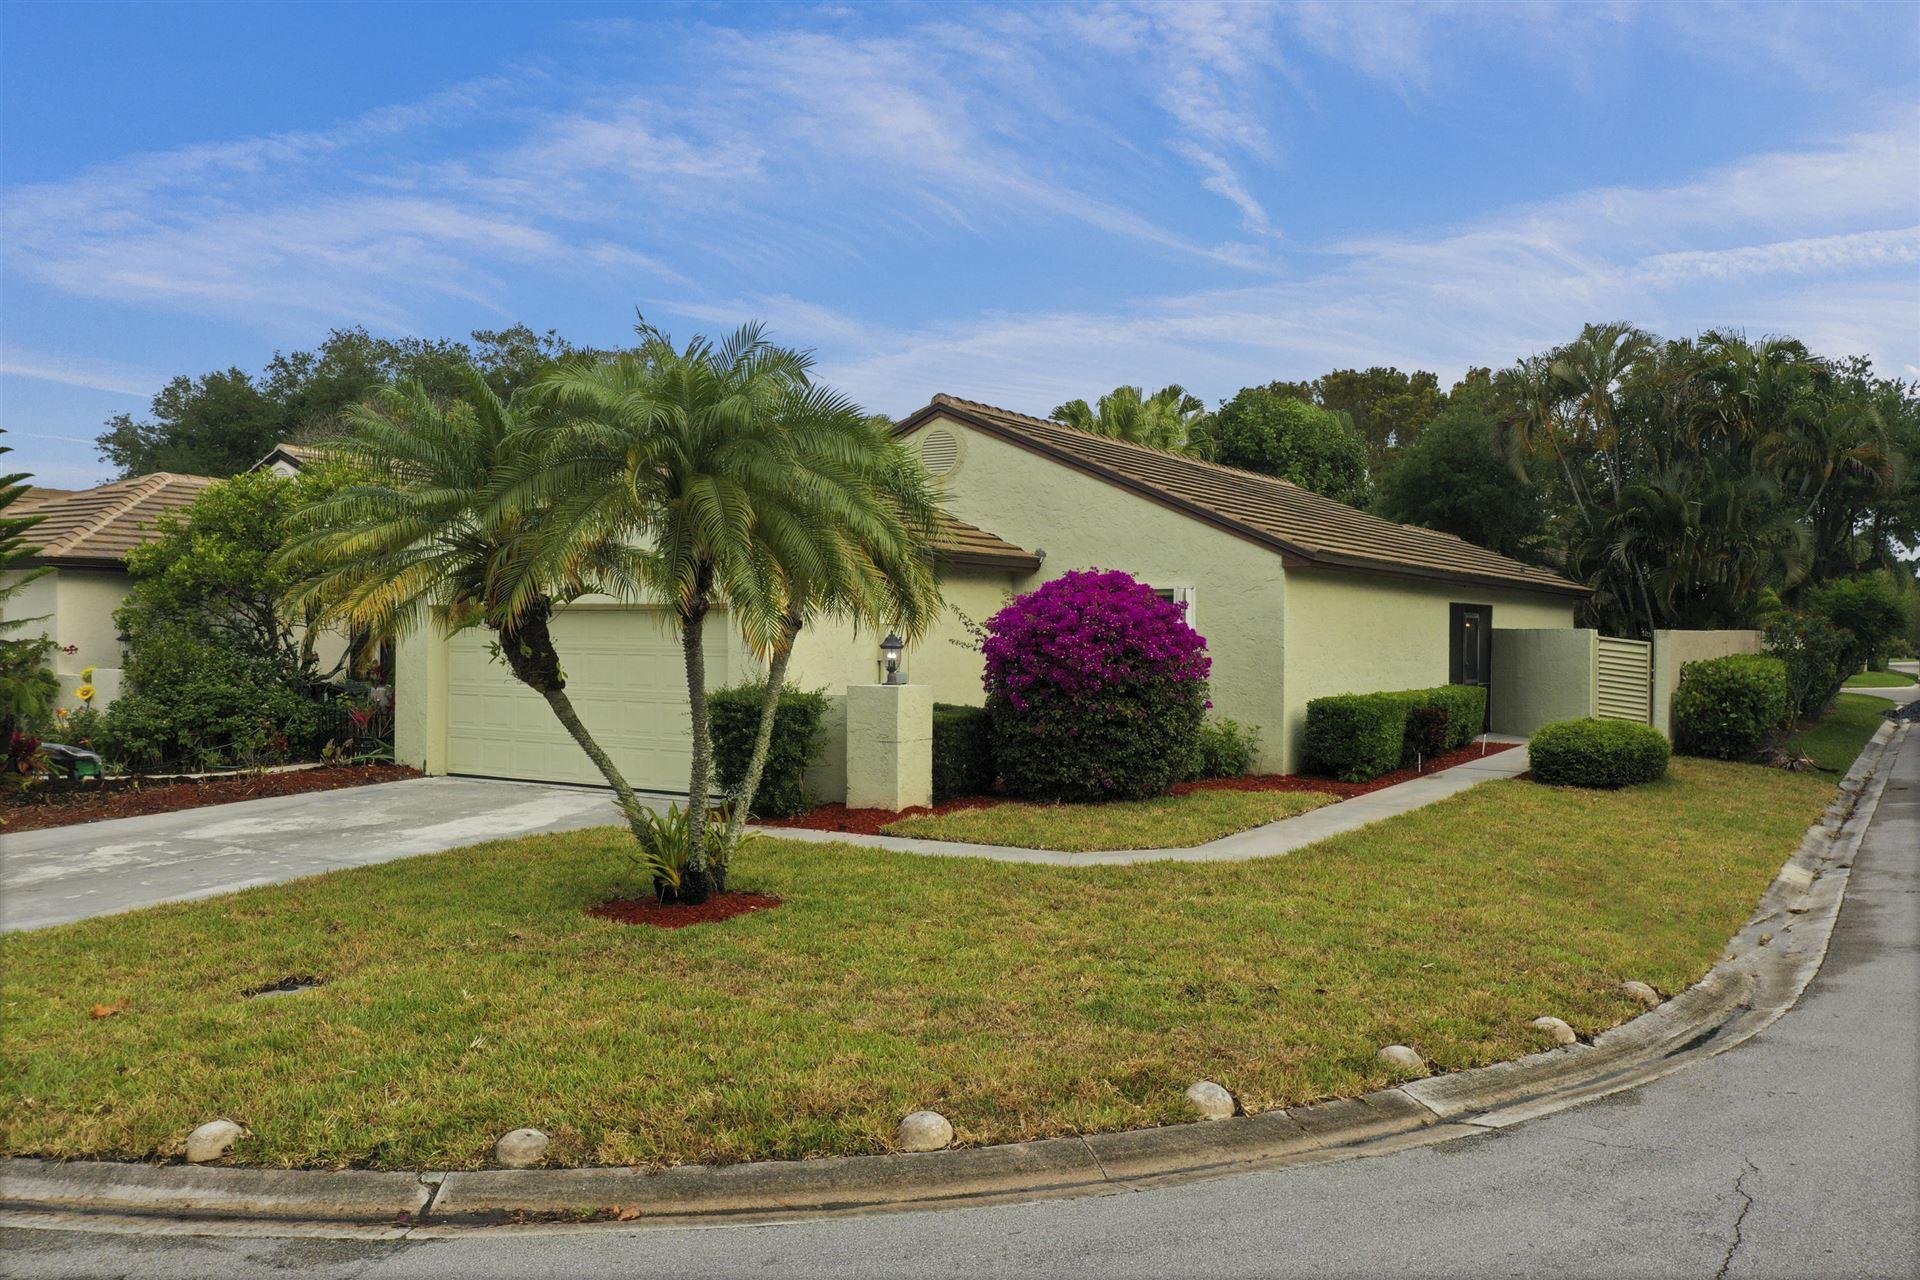 Photo of 54 Ironwood Way N, Palm Beach Gardens, FL 33418 (MLS # RX-10709826)